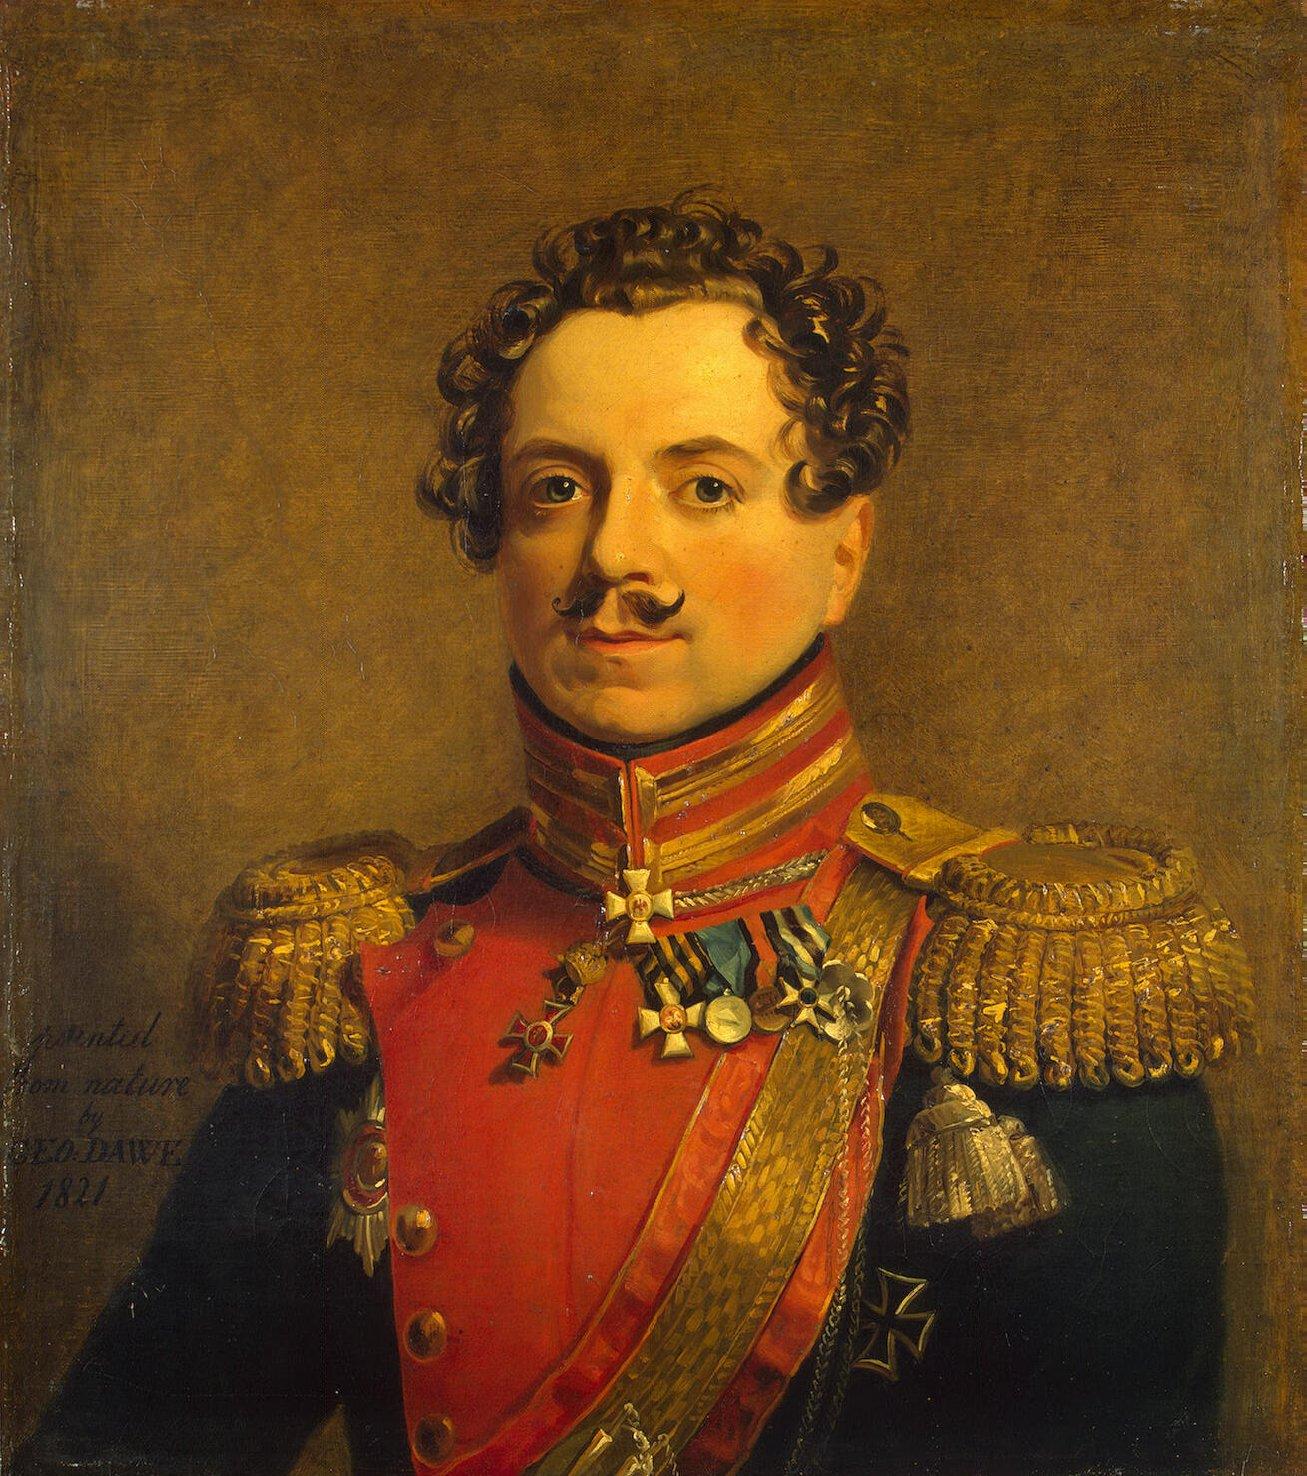 Андреевский, Степан Степанович